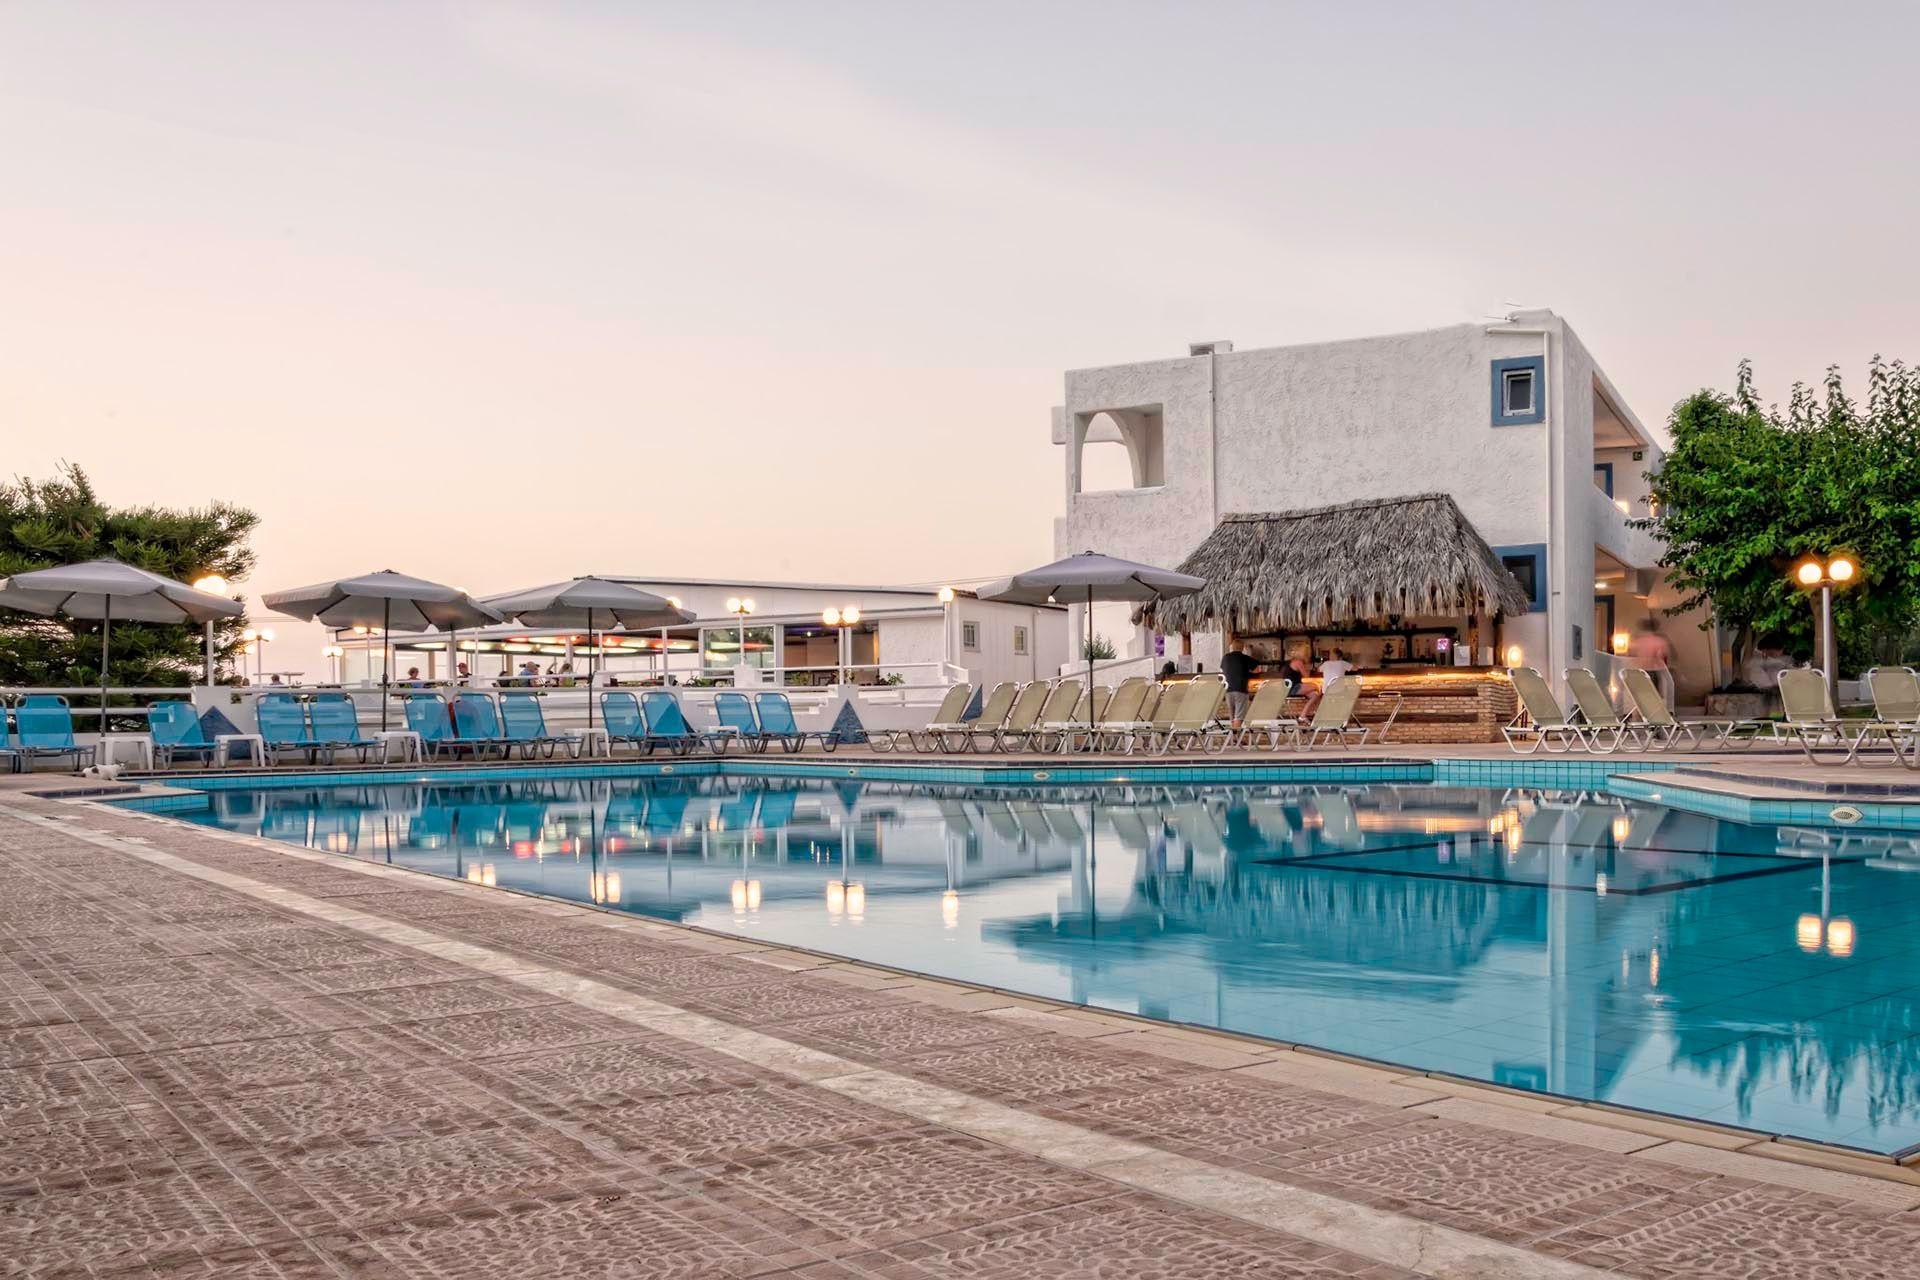 4* Akoya Resort - Ρέθυμνο, Κρήτη ✦ 2 Ημέρες (1 Διανυκτέρευση)